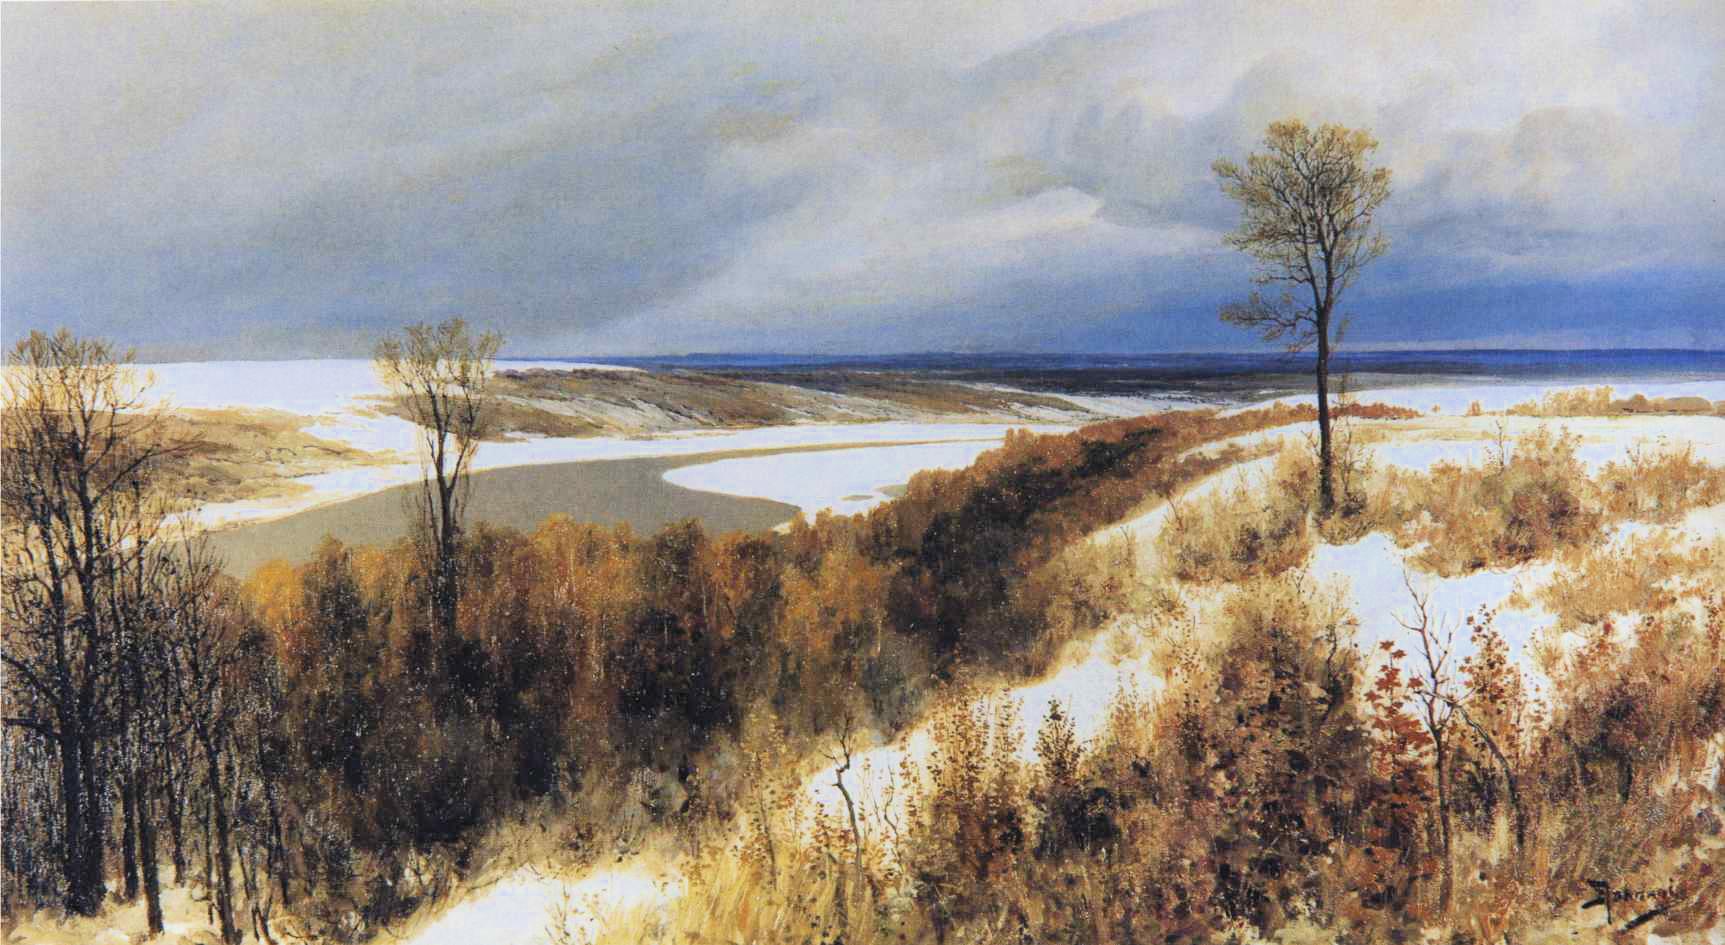 Russian artist Vasily Polenov: biography, creativity, and interesting facts 9